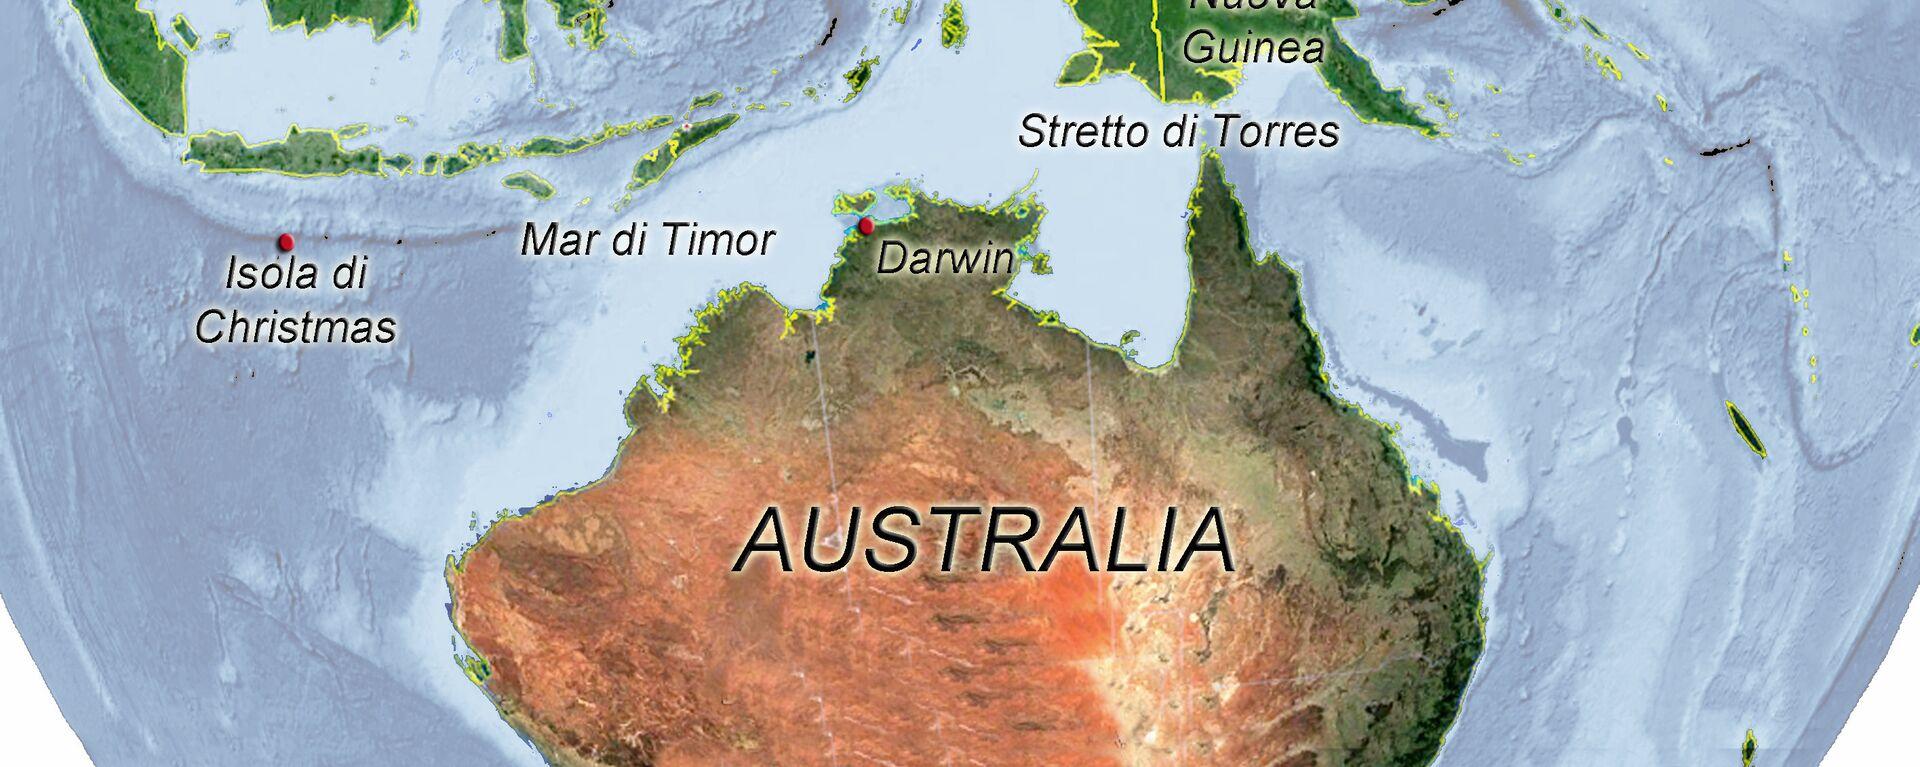 Australia, mappa immigrazione clandestina - Sputnik Italia, 1920, 14.08.2018